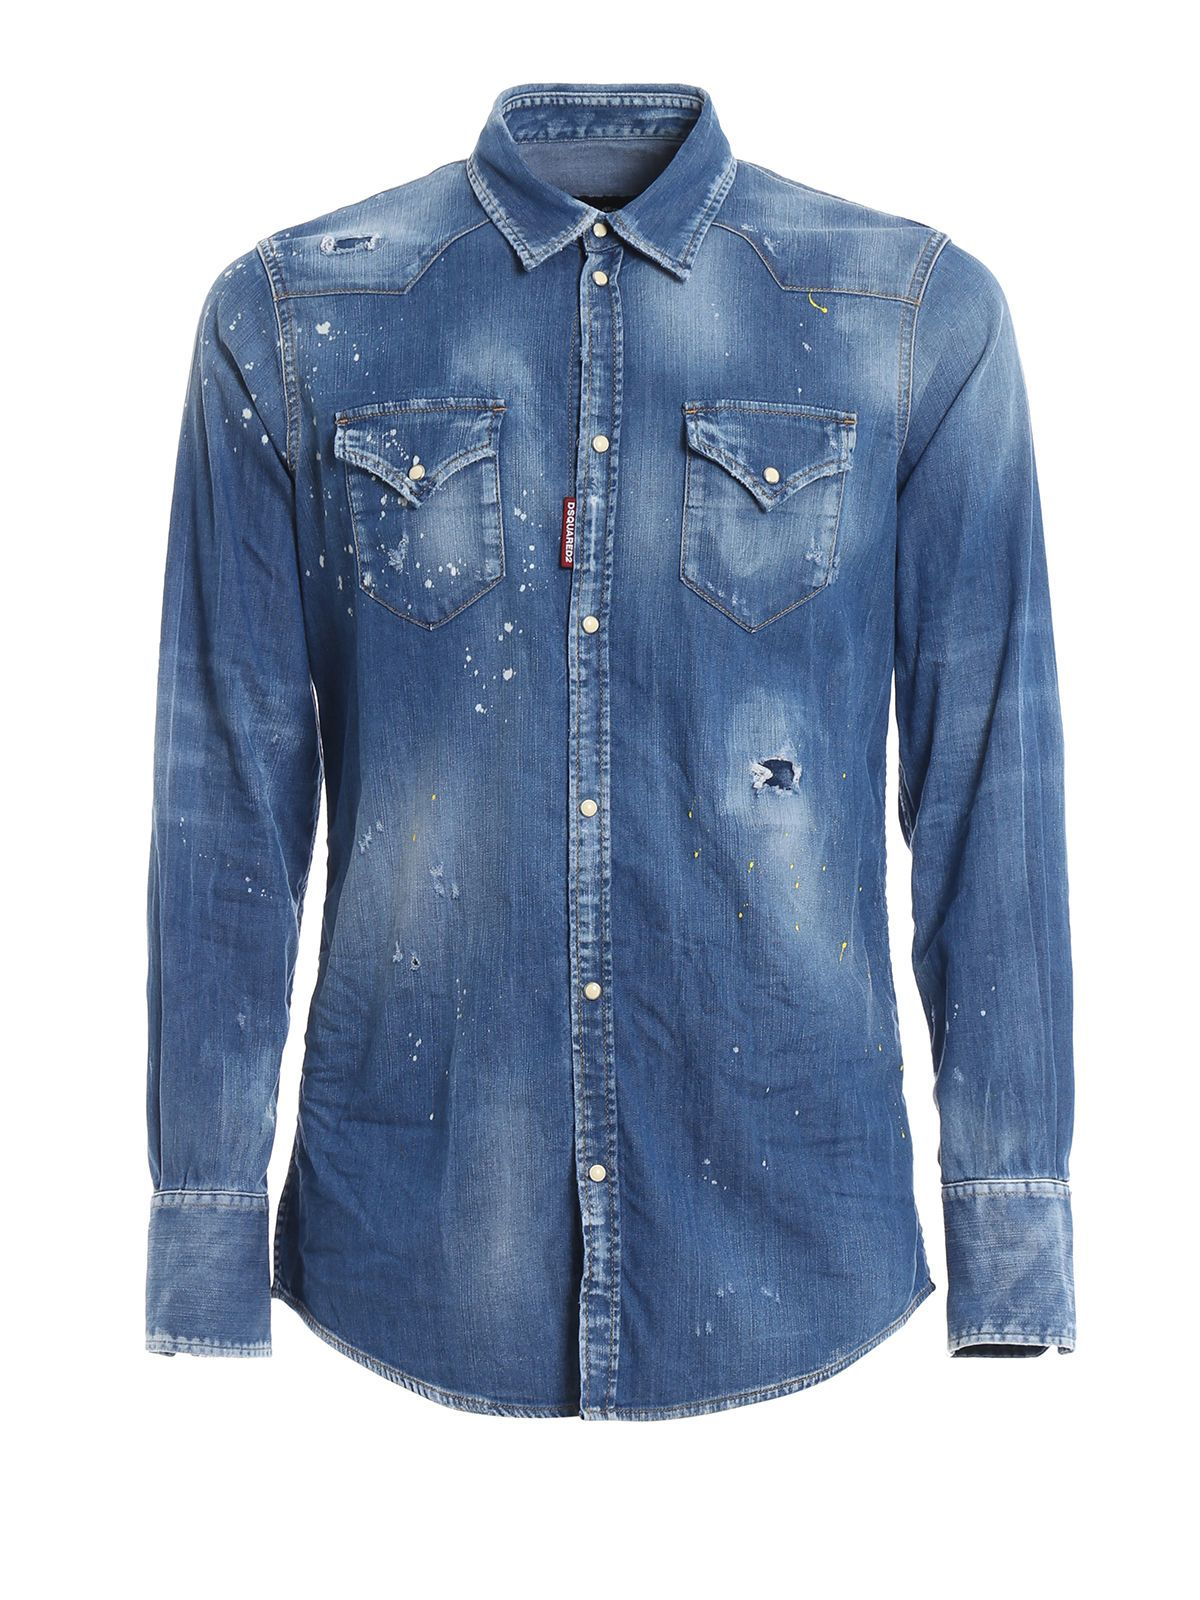 81eda1fce5 Dsquared2 Dsquared2 Bleached Effect Denim Shirt - Blue - 10822883 ...